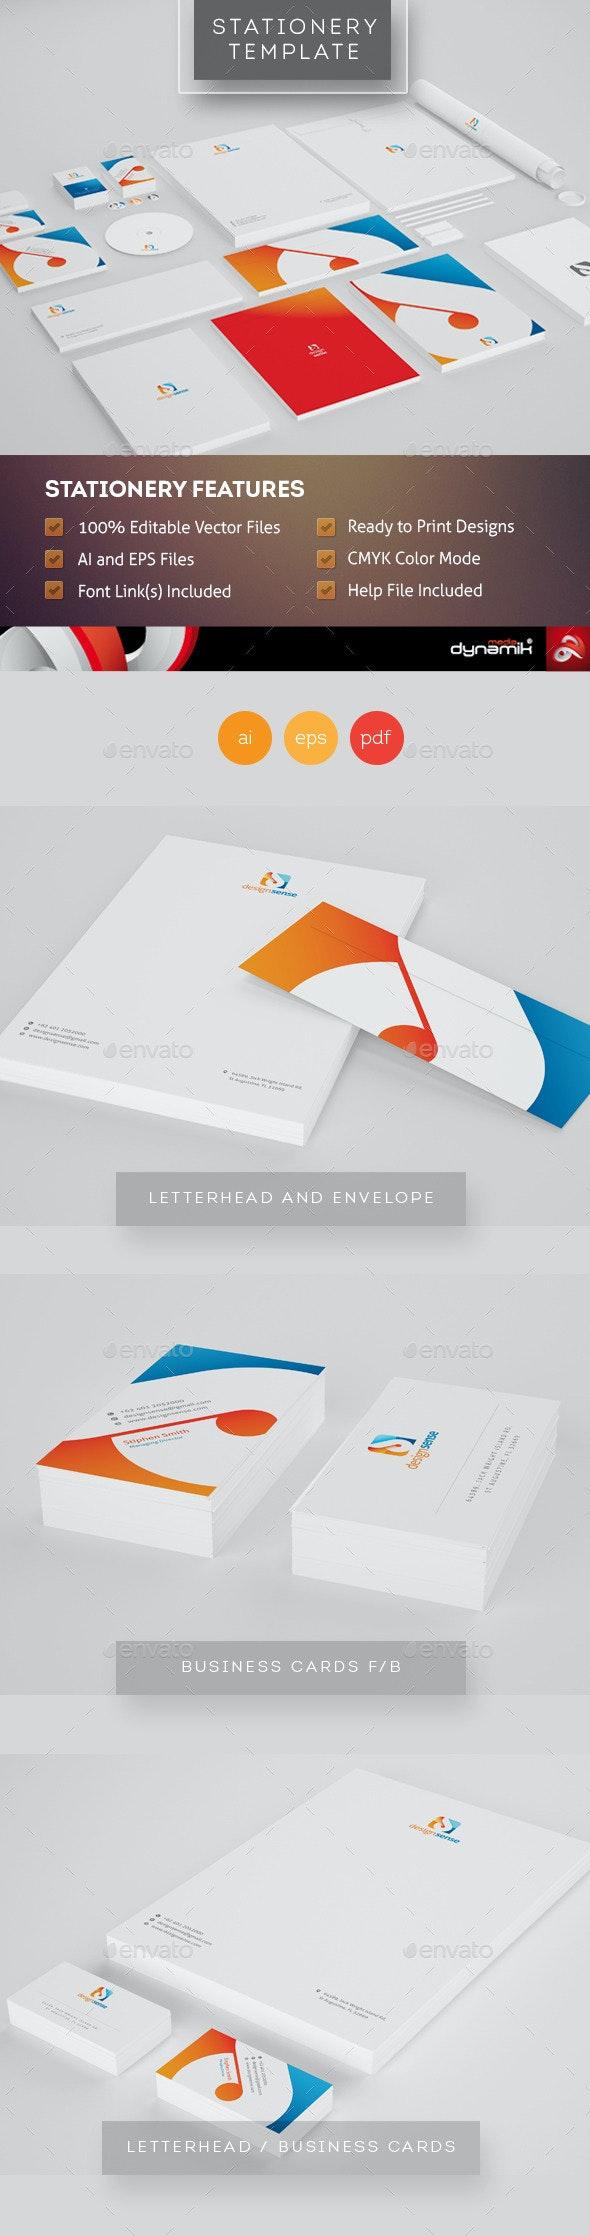 Design Sense - Corporate Identity Template - Stationery Print Templates